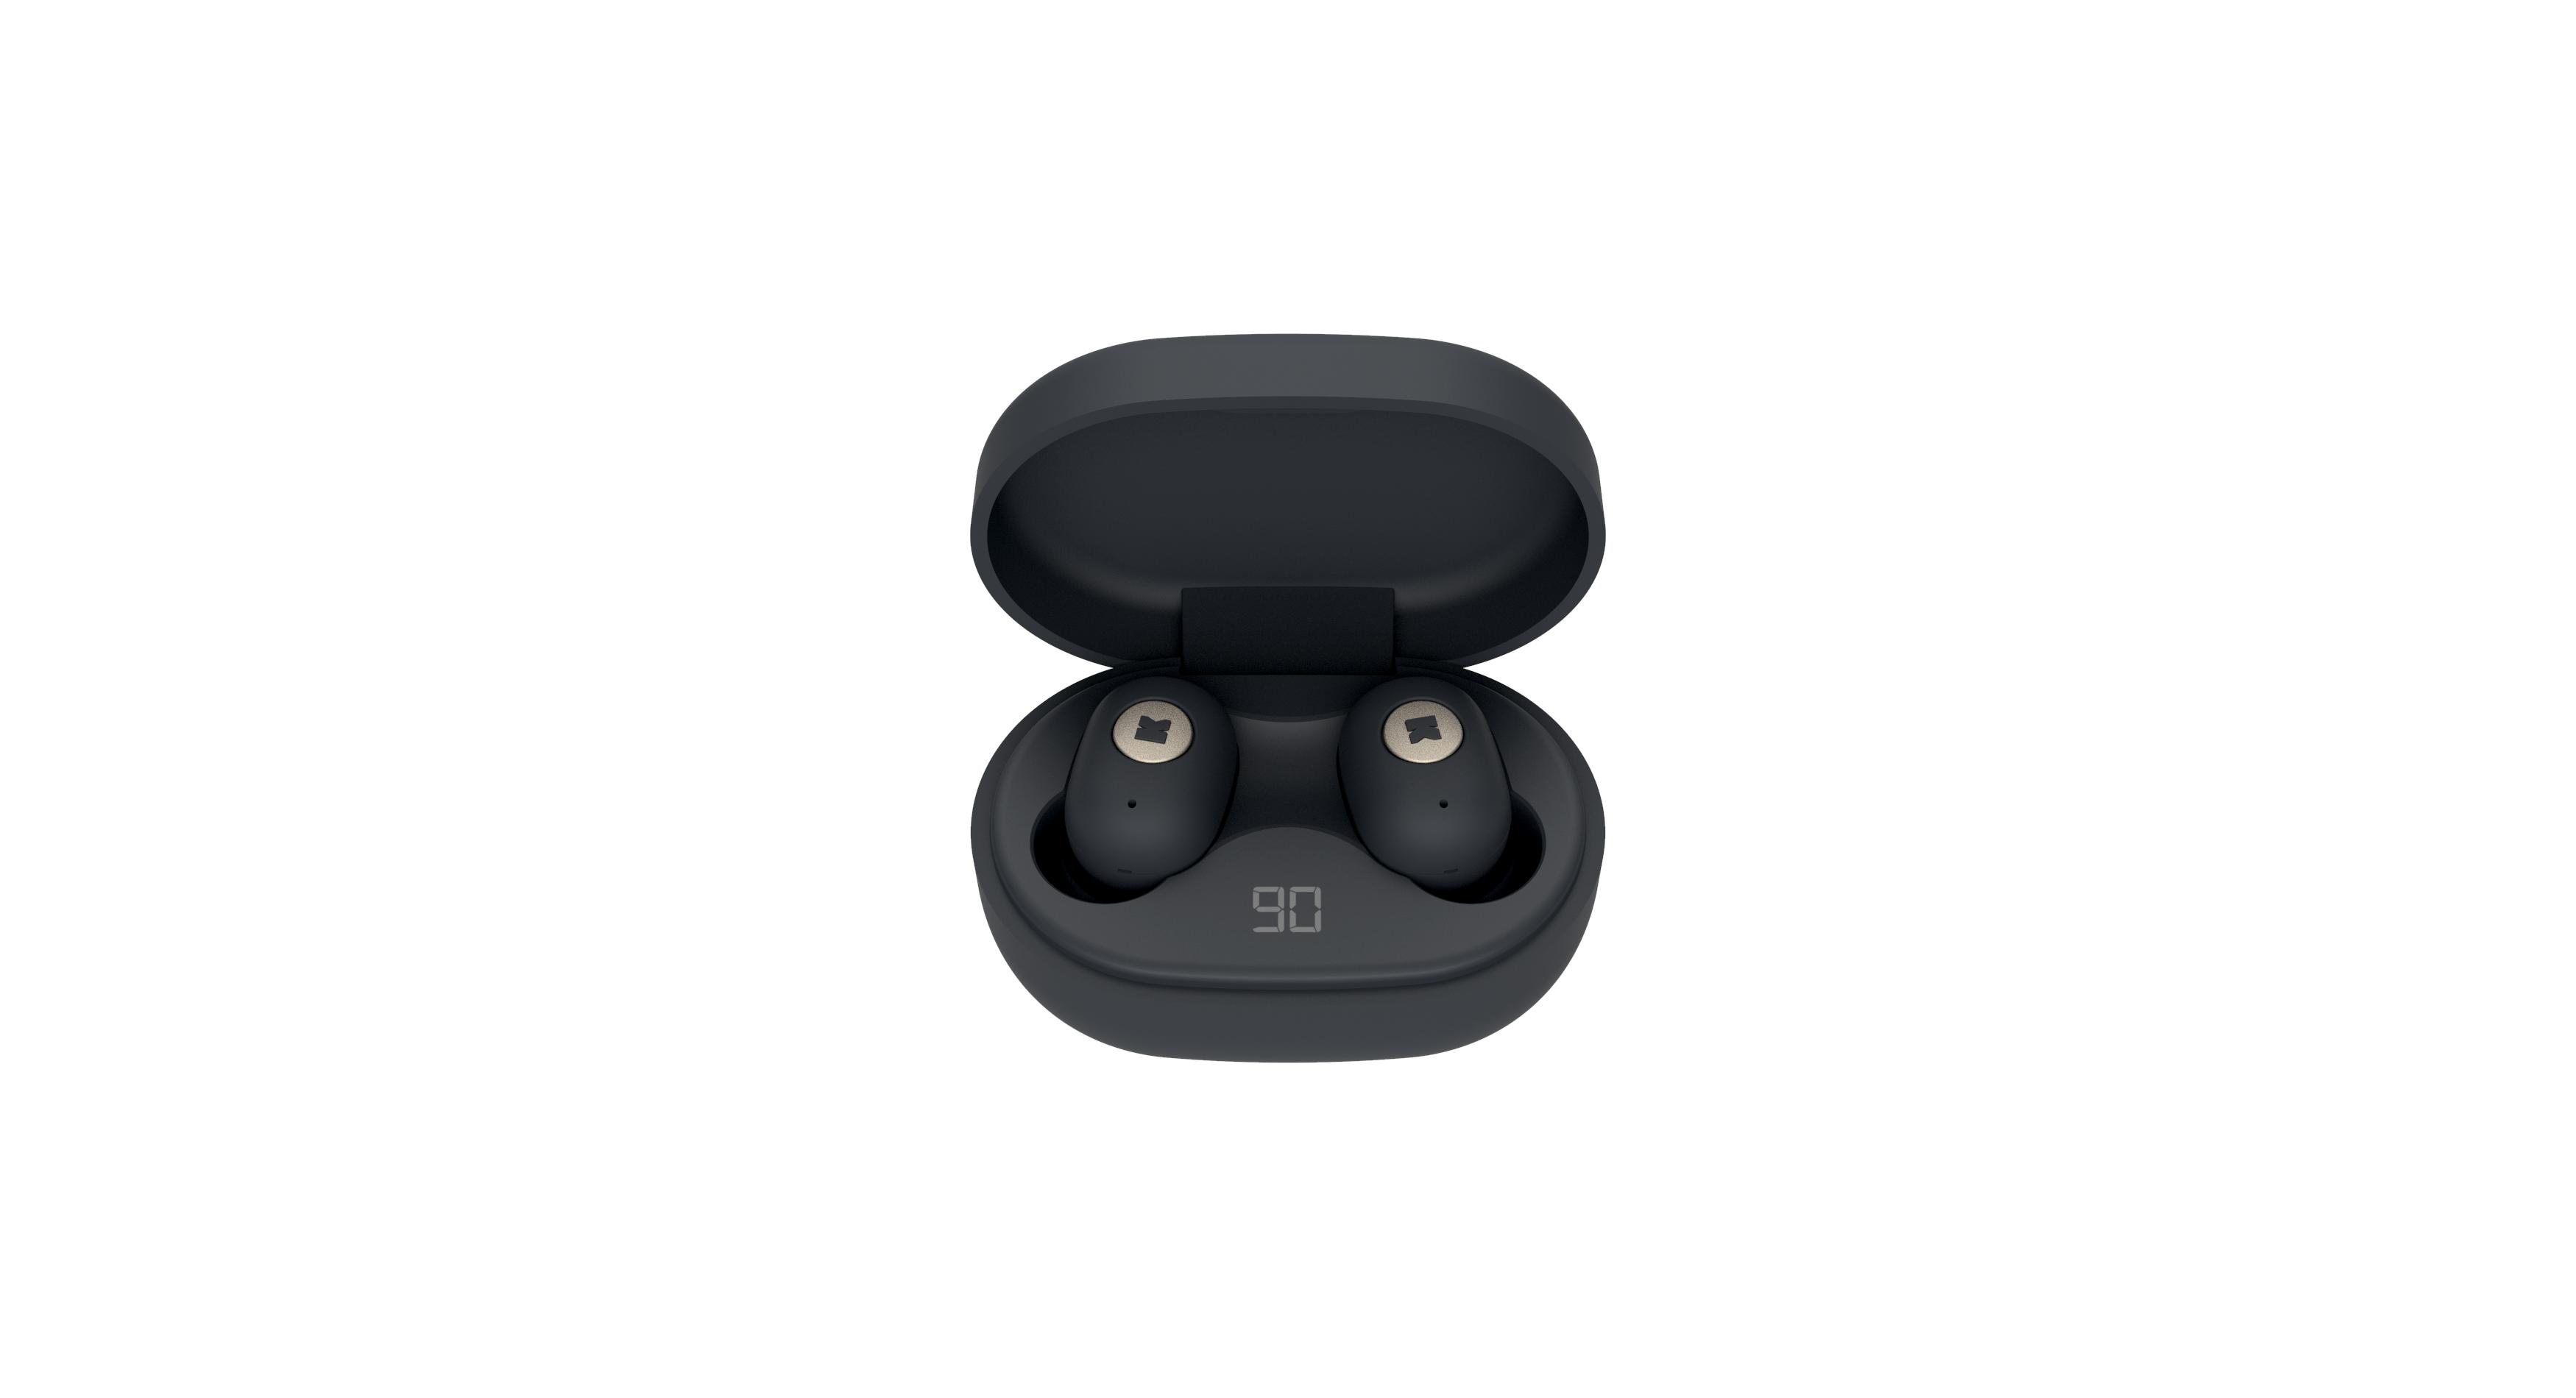 KreaFunk - aBEAN In-Ear Bluetooth Headphones - Black (KFLP02)